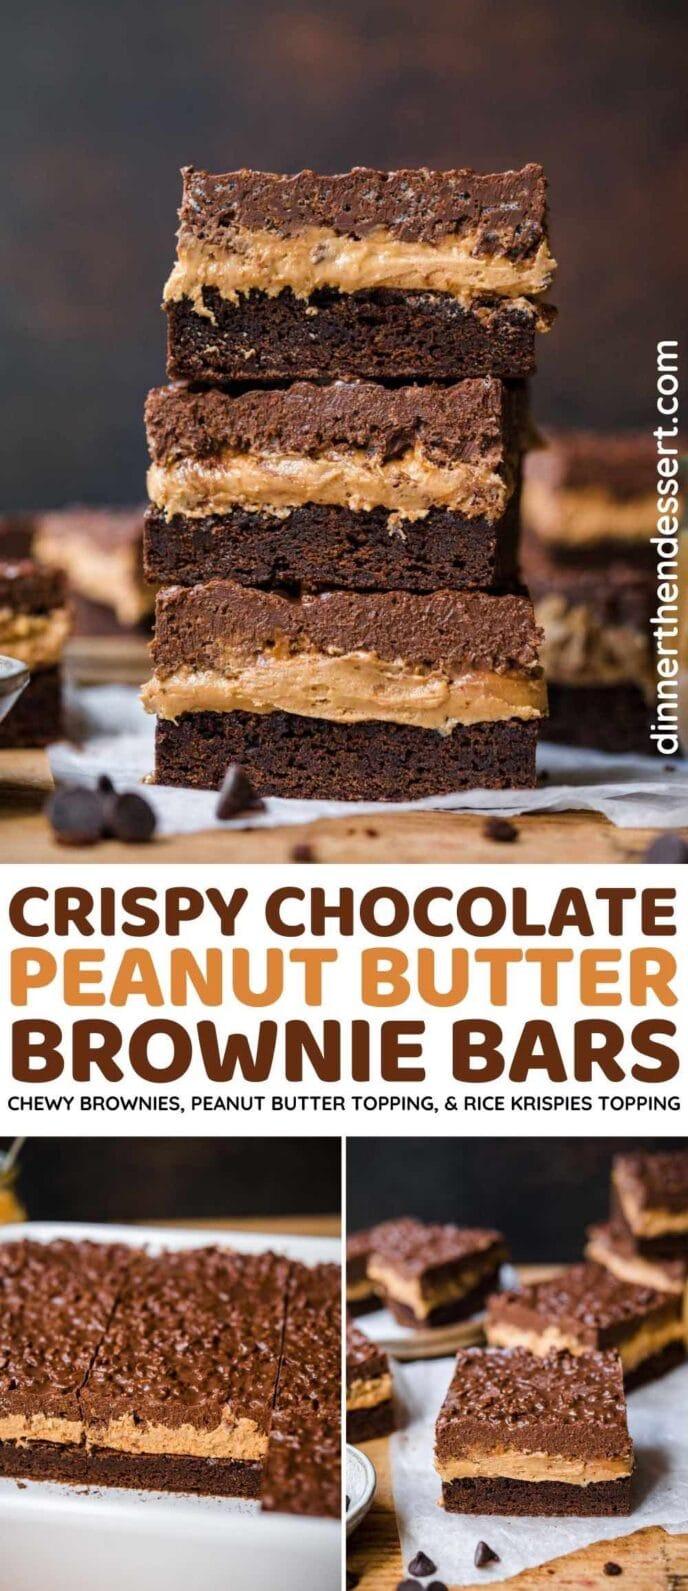 Crispy Chocolate Peanut Butter Bars